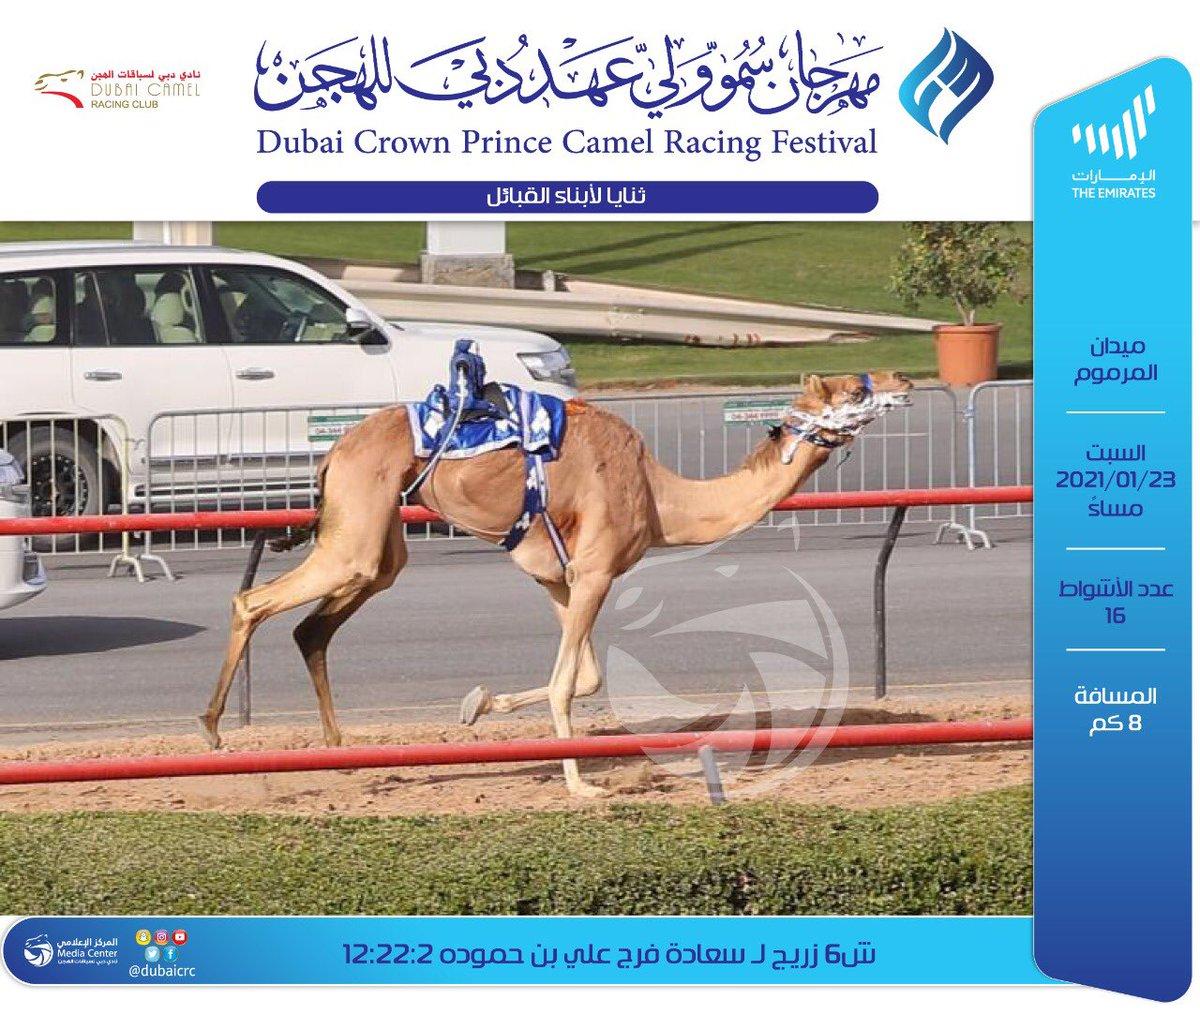 #مهرجان_ولي_عهد_دبي_للهجن_2021 #نادي_دبي_لسباقات_الهجن #المركز_الاعلامي #فزاع #faz3  #almarmoom #Dubaicrc #Racing_club  #Dubai #VisitDubai  #uae #sports #fun #camels #heritage #race #tourism #emirates  #photography  #dubailife  #DCRC #mydubai